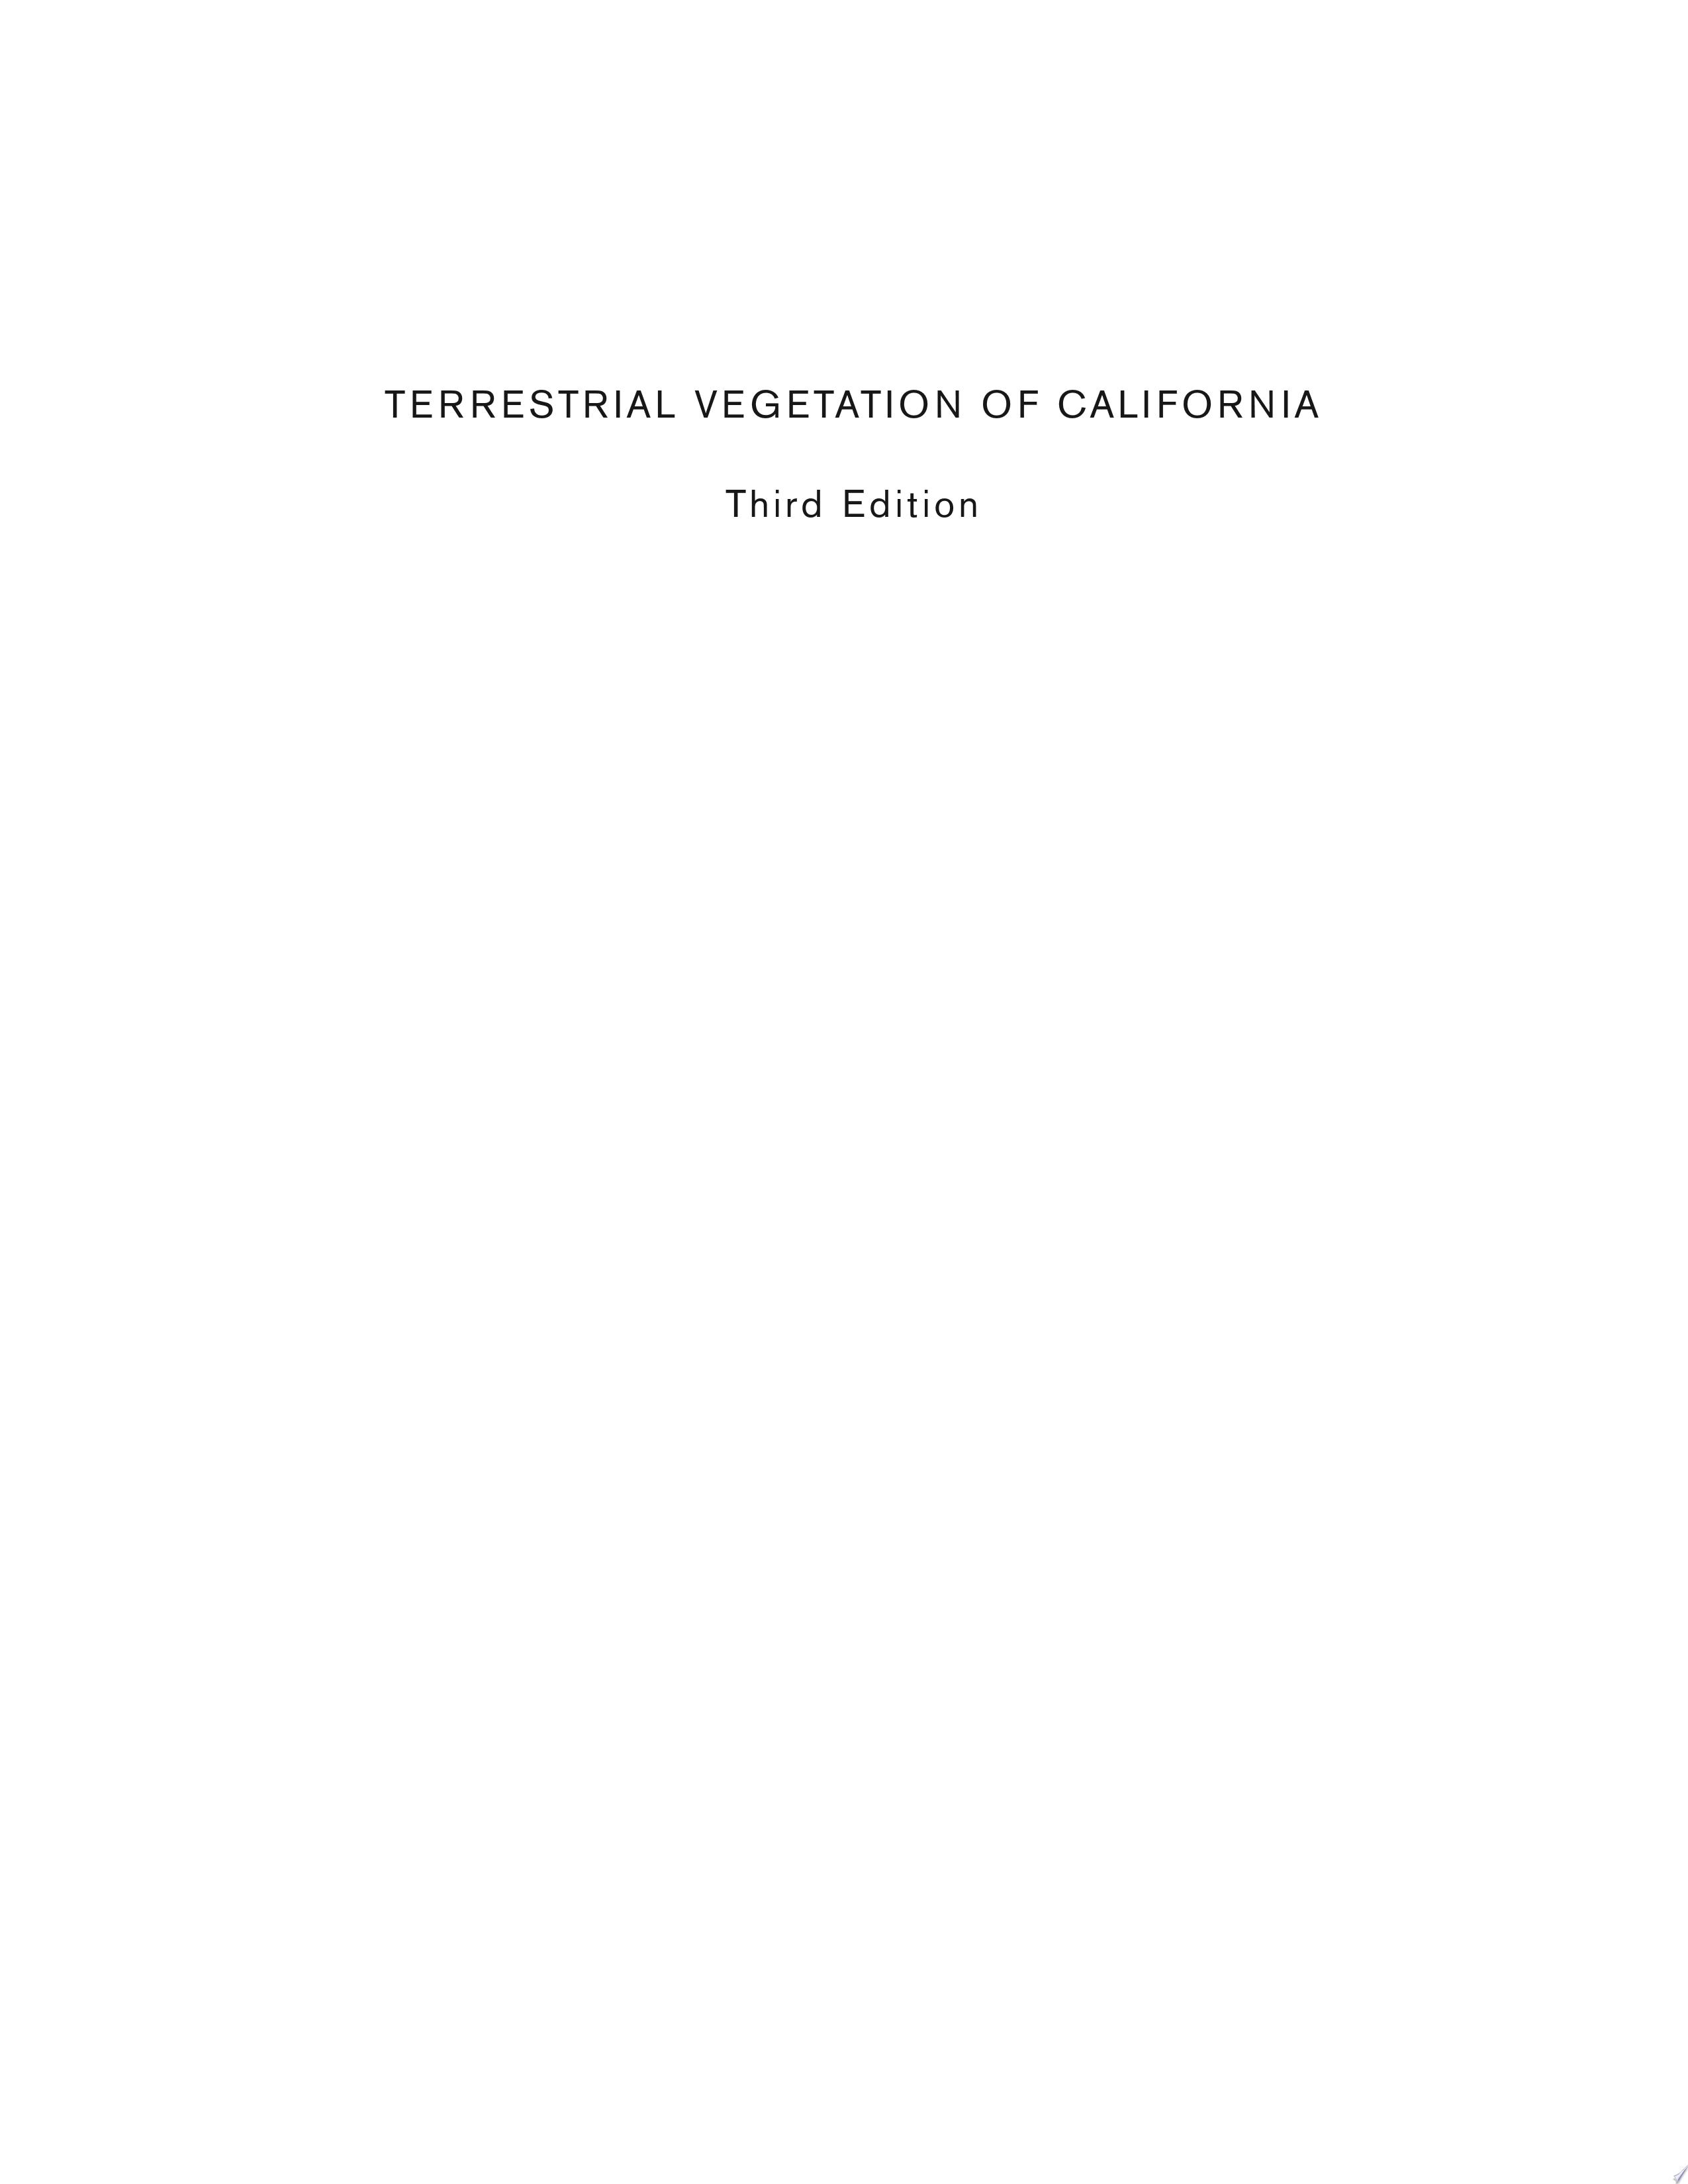 Terrestrial Vegetation of California  3rd Edition